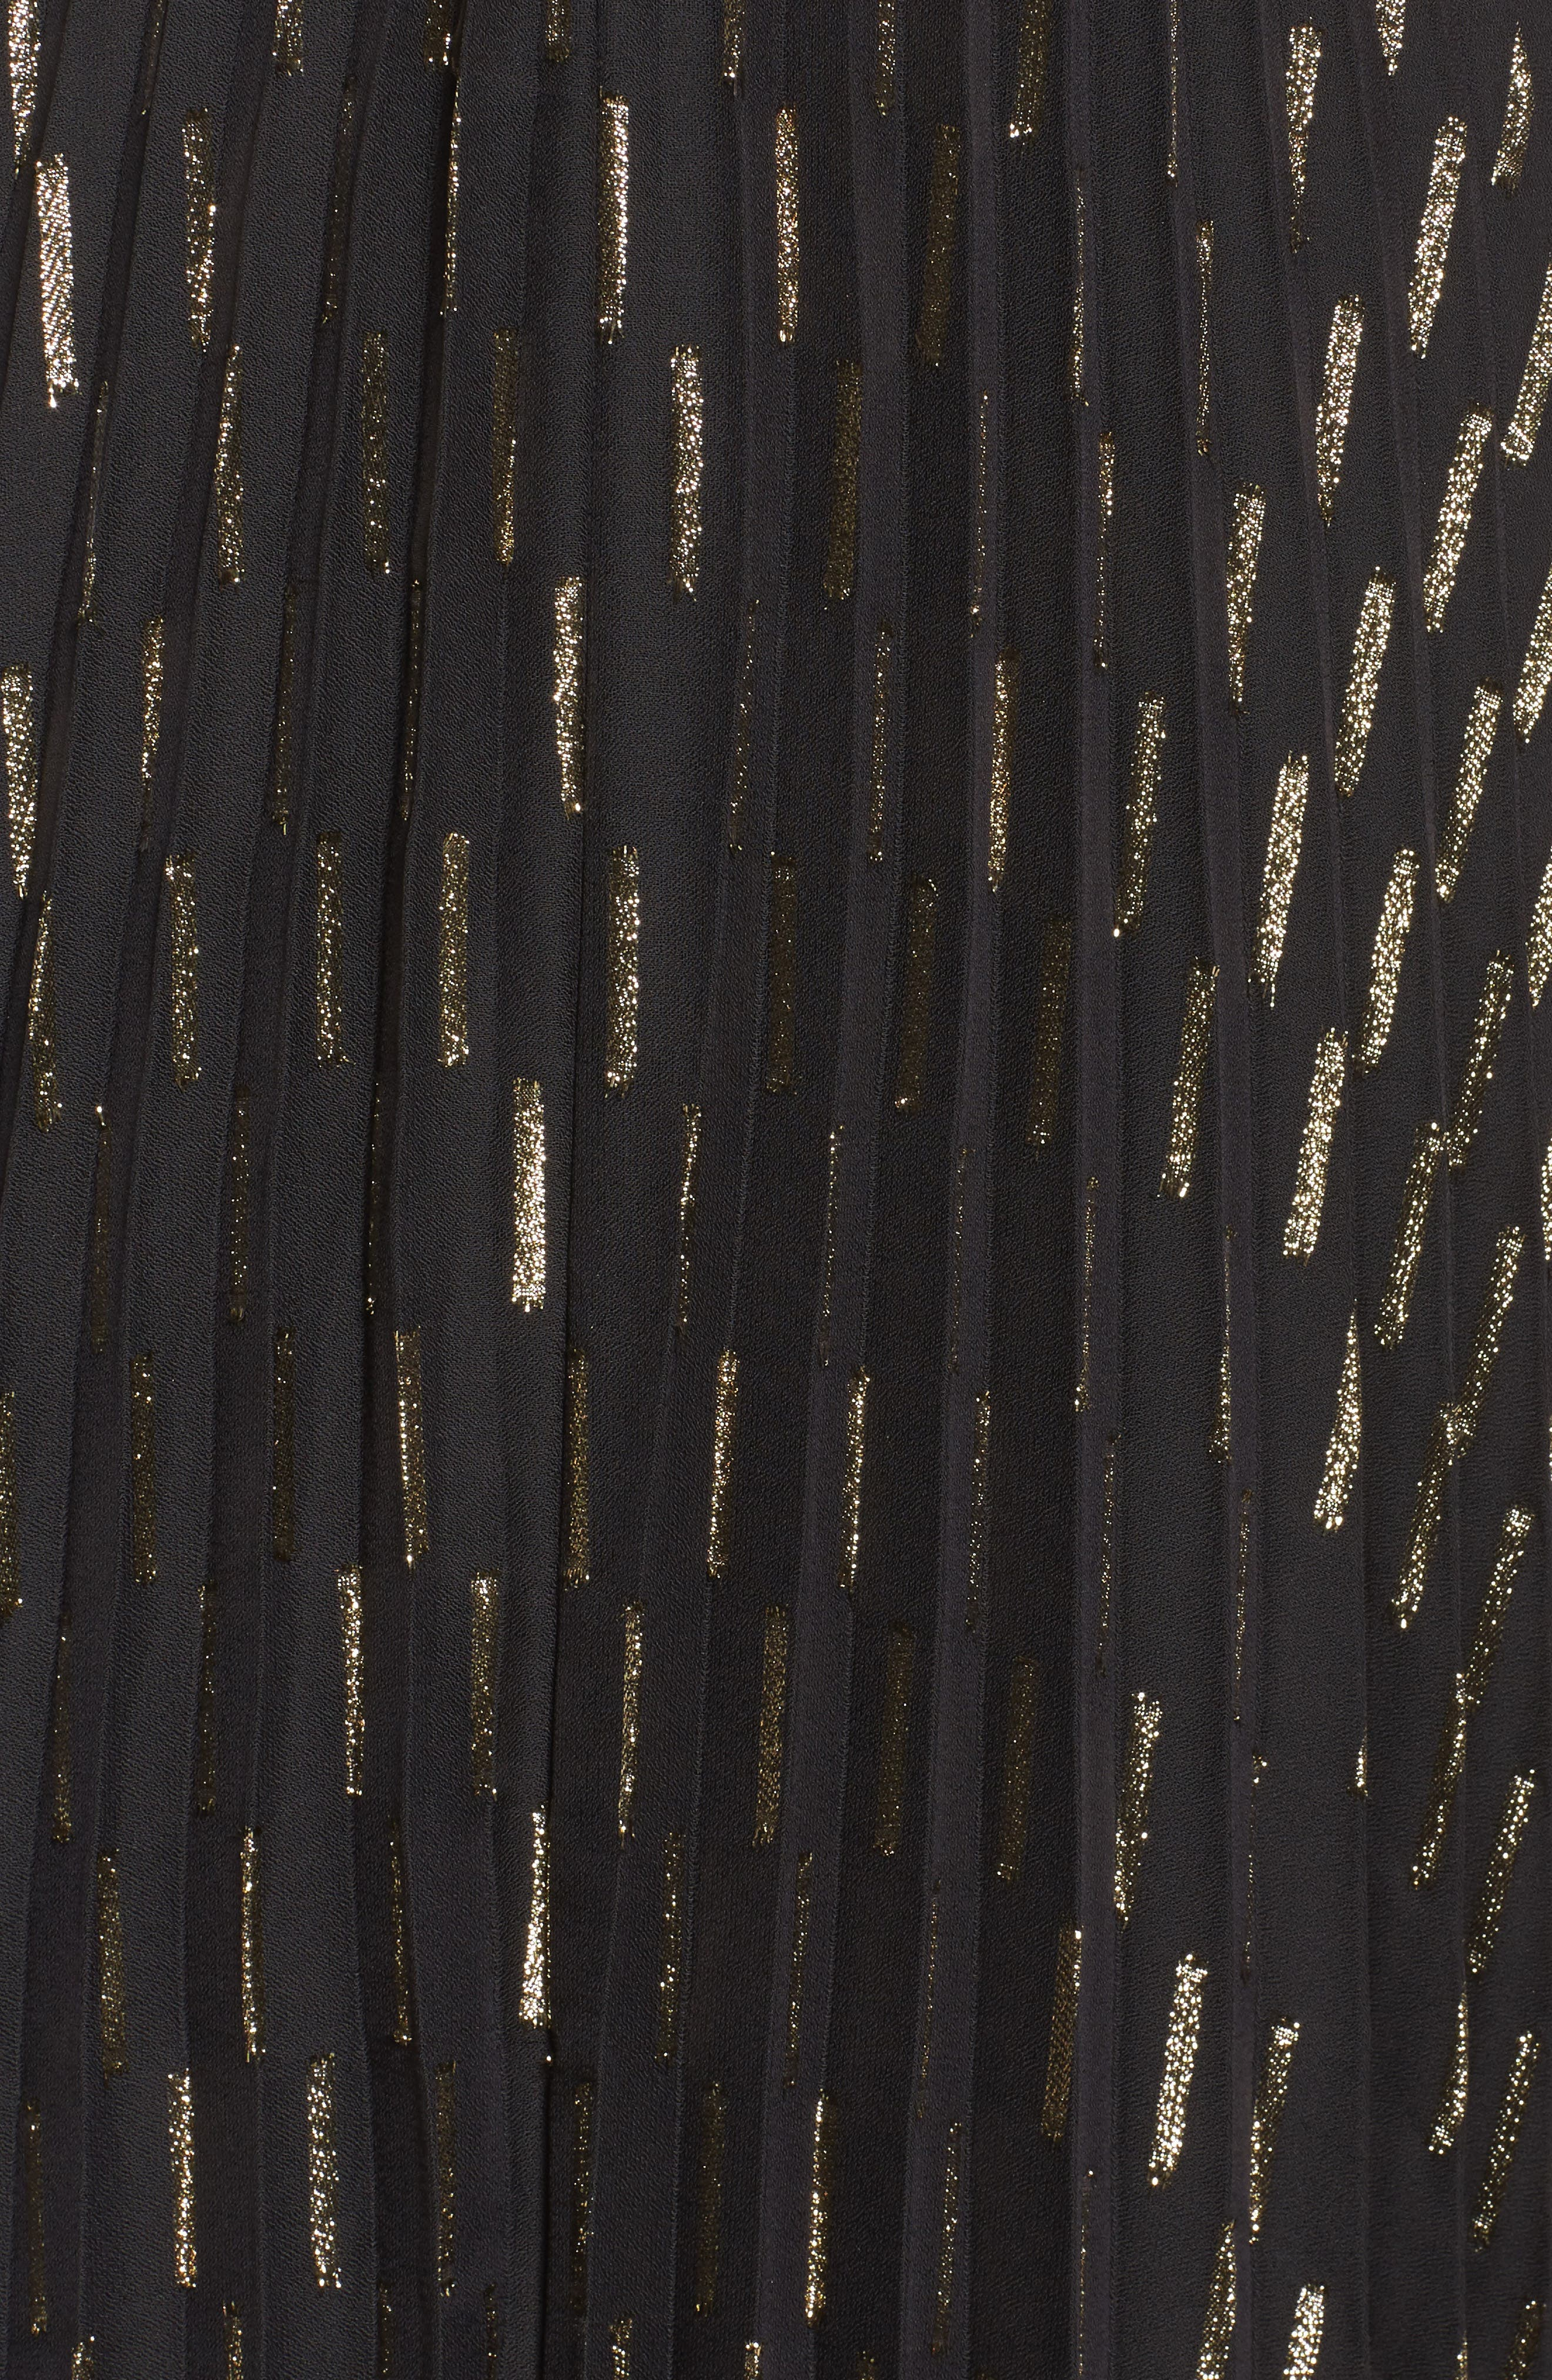 Metallic Detail Pleated Chiffon Maxi Skirt,                             Alternate thumbnail 7, color,                             Black Gold